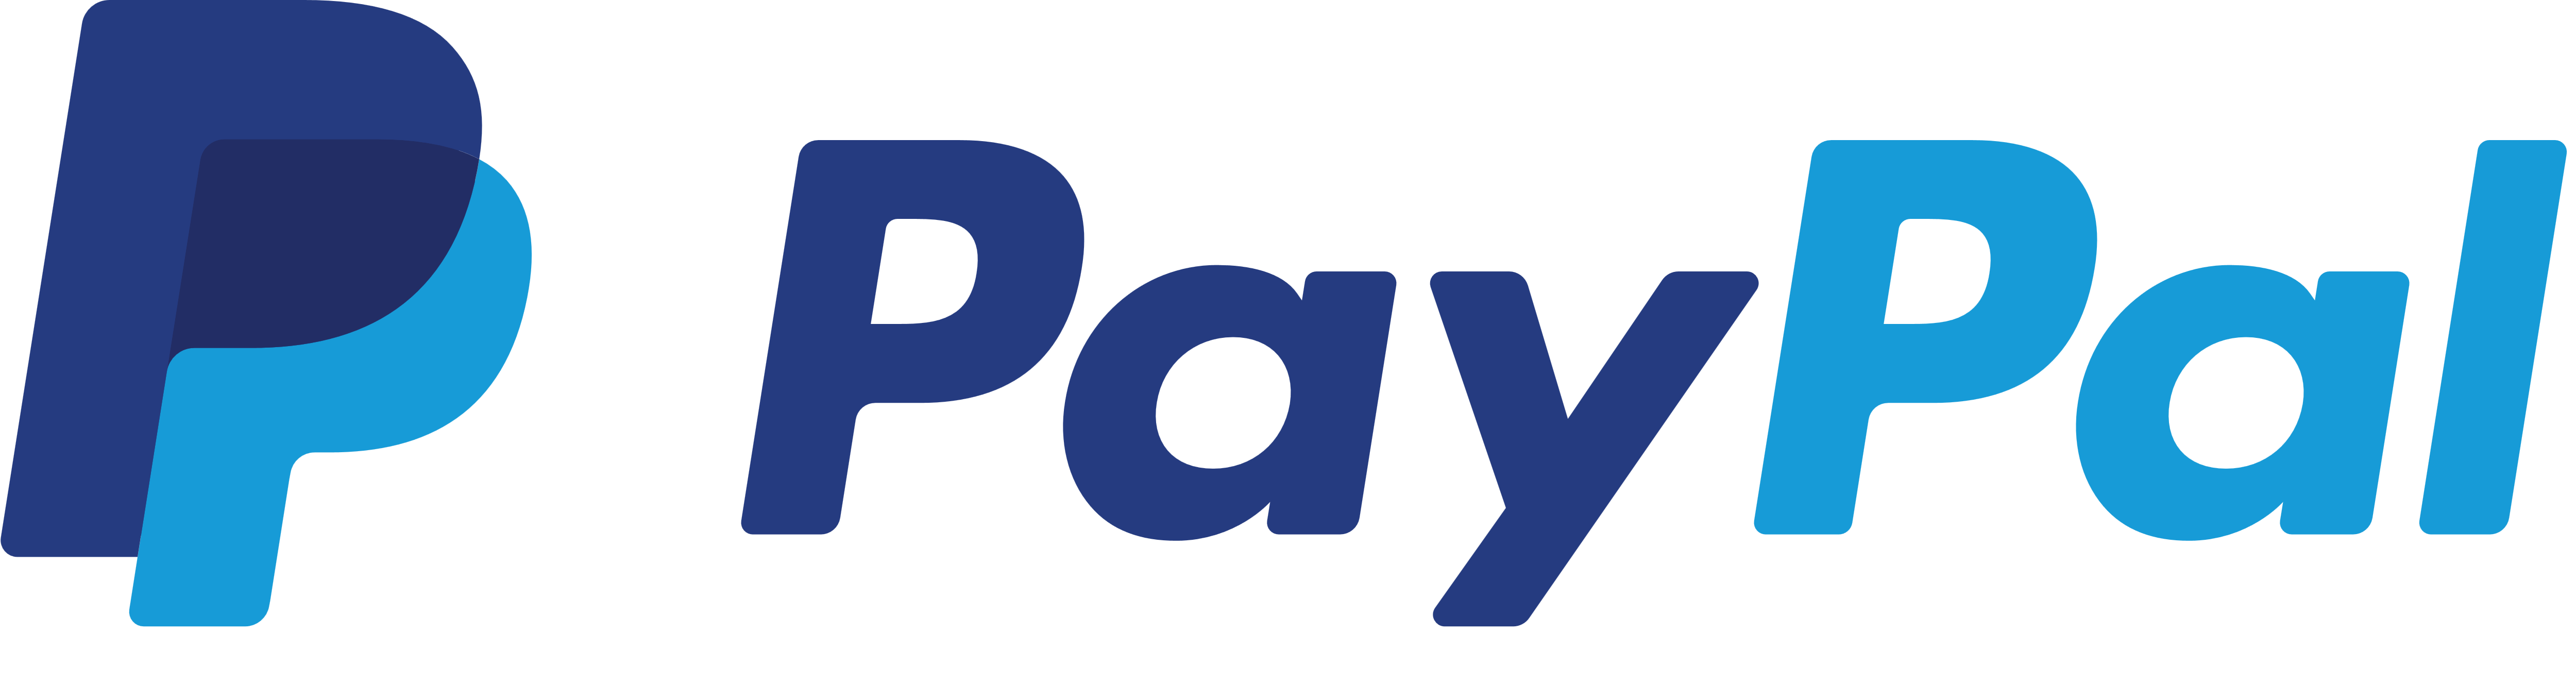 PayPal - Dervla Trainor